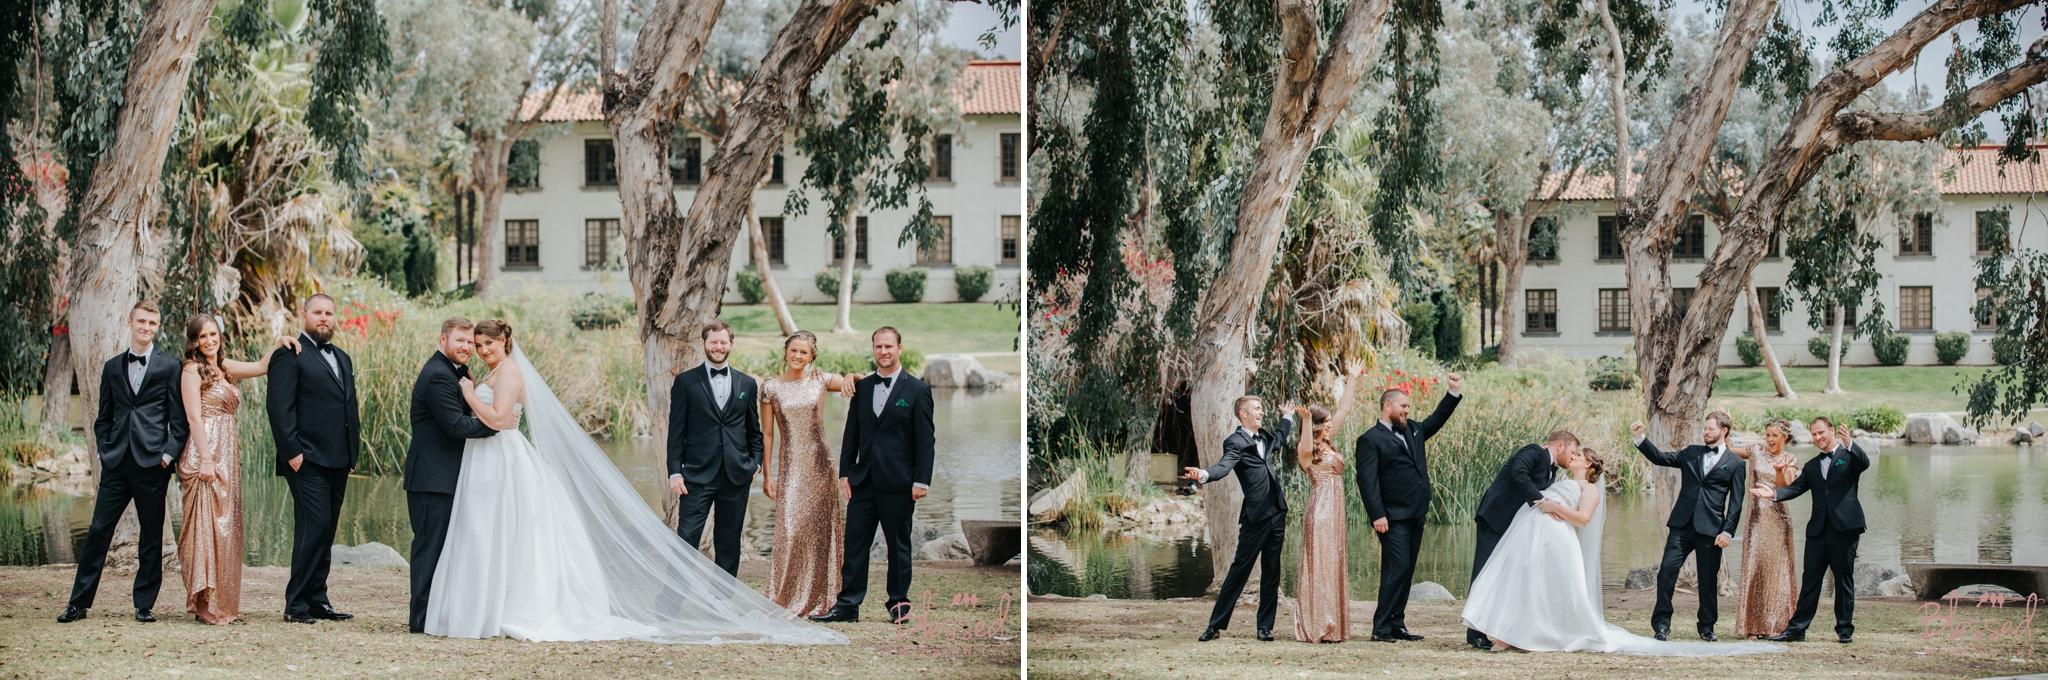 Orfila Vinery Wedding by Blessed Wedding Photography 28.jpg